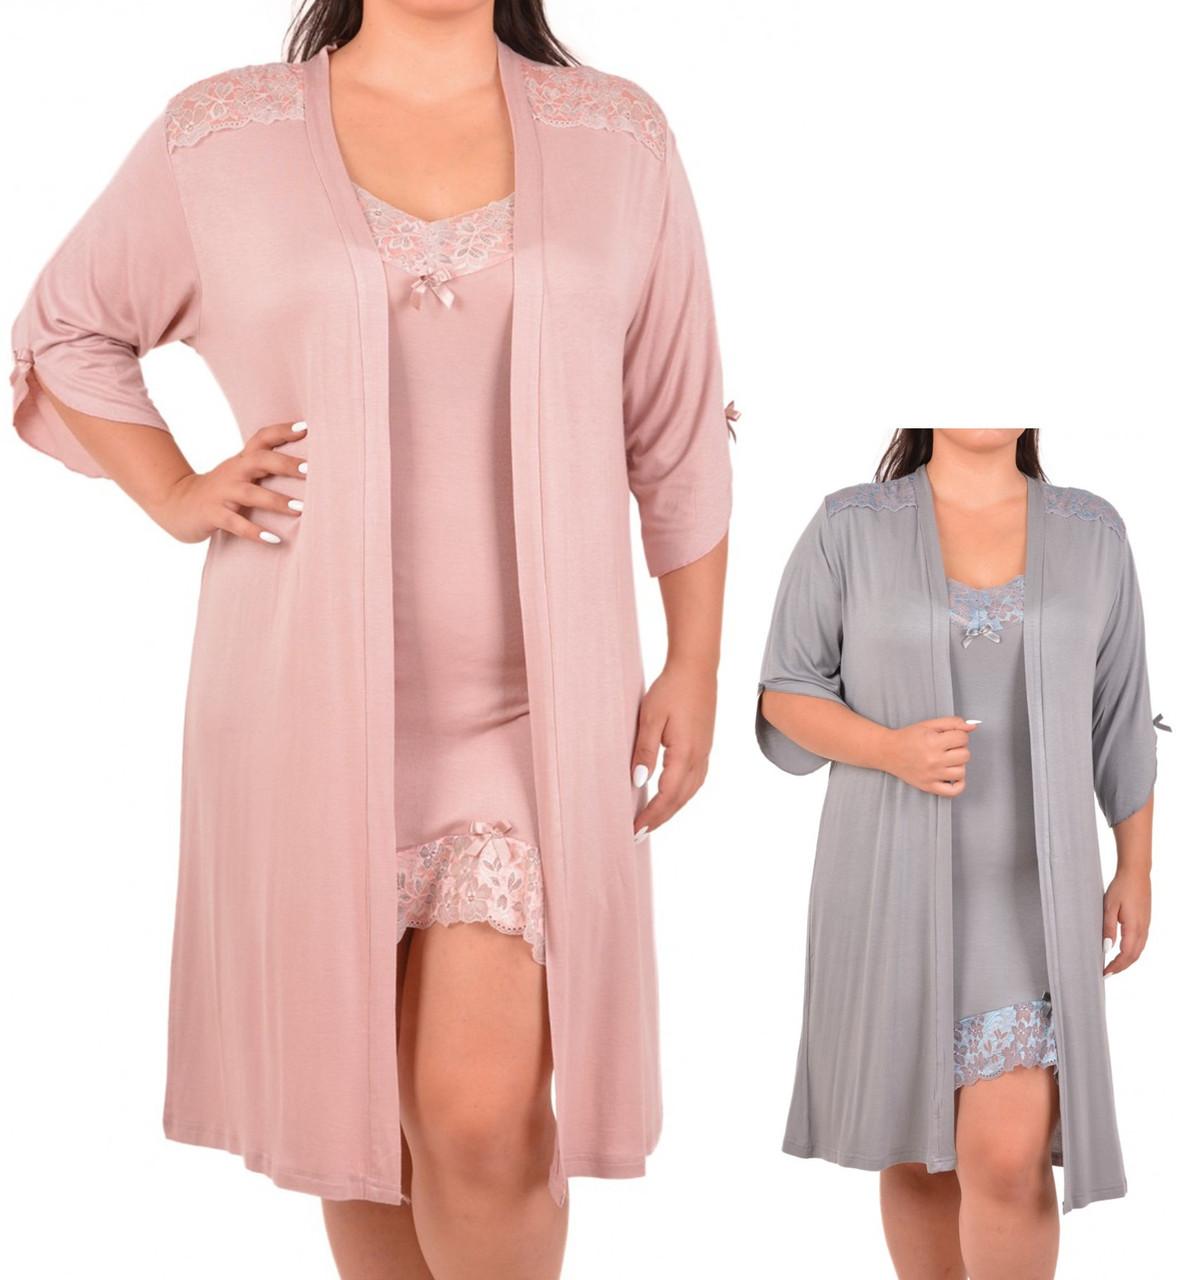 Комплект женский (футболка короткий рукав+штаны),  вискоза, оптом  ПАК/3 шт  2ХL-4ХL, Nicoletta